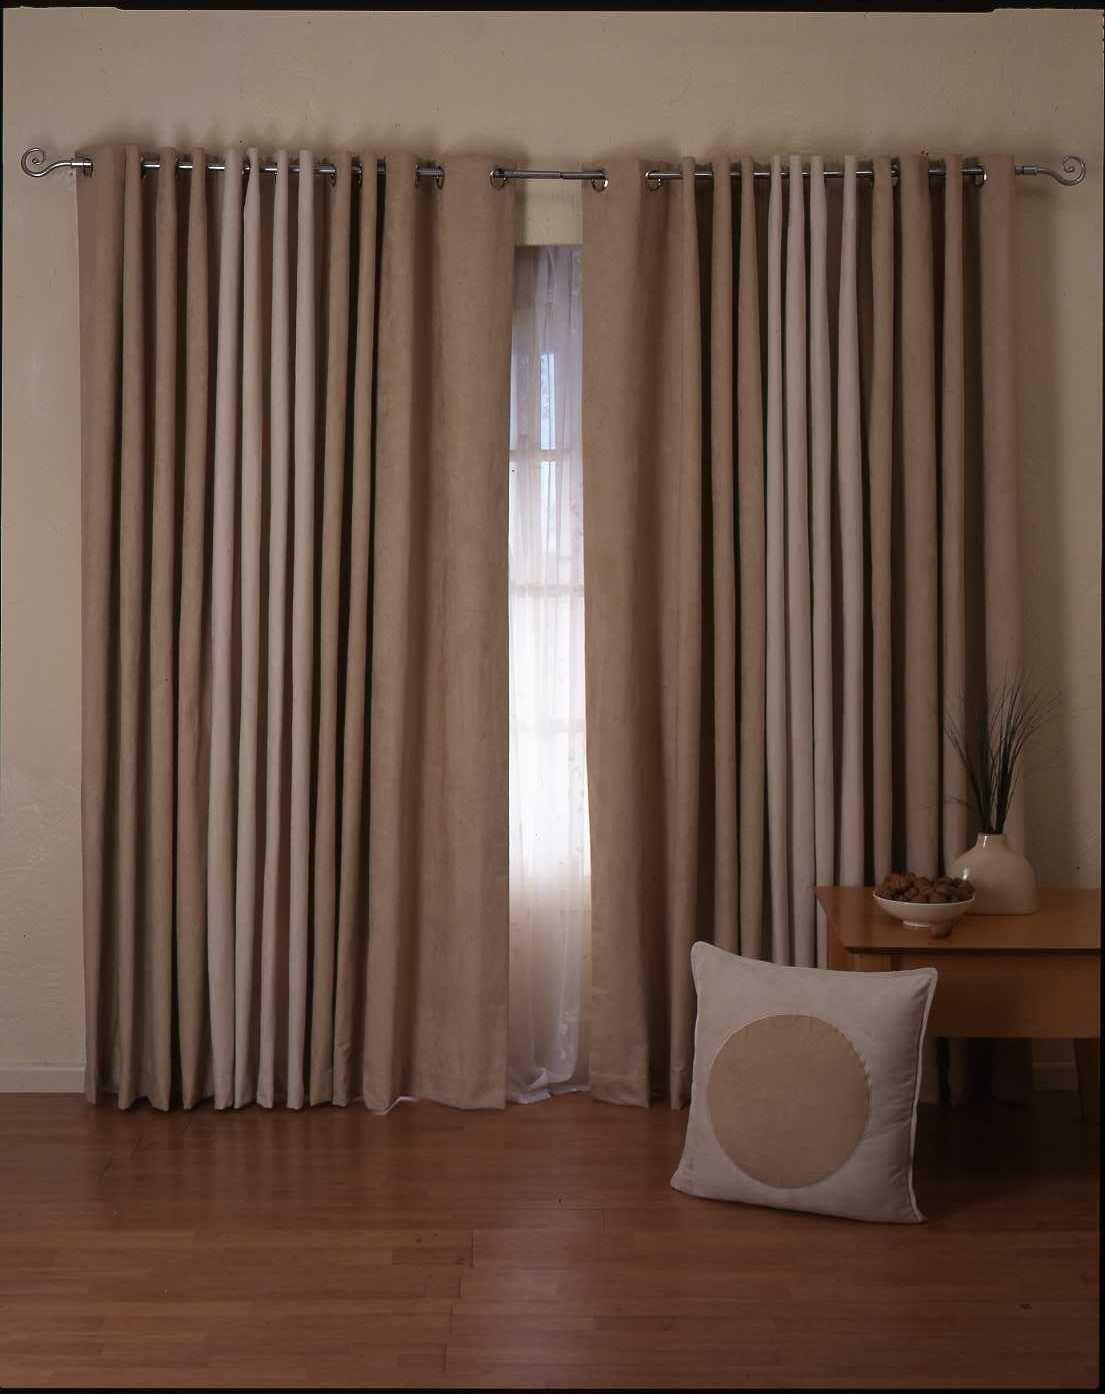 Cotenza modern curtains nice modern net curtains simple modern curtain - Curtains Casa Shamuzzi Hotel Projects